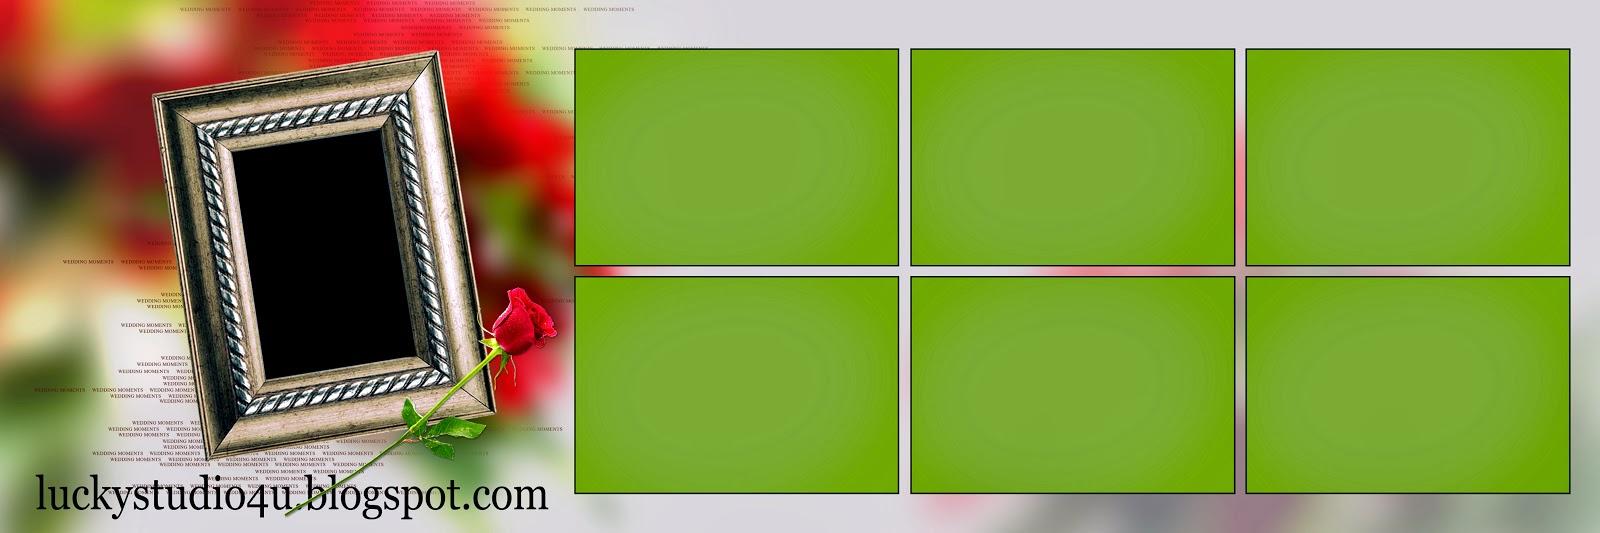 12x36 Psd Files Pakistan Free Download | Joy Studio Design Gallery ...